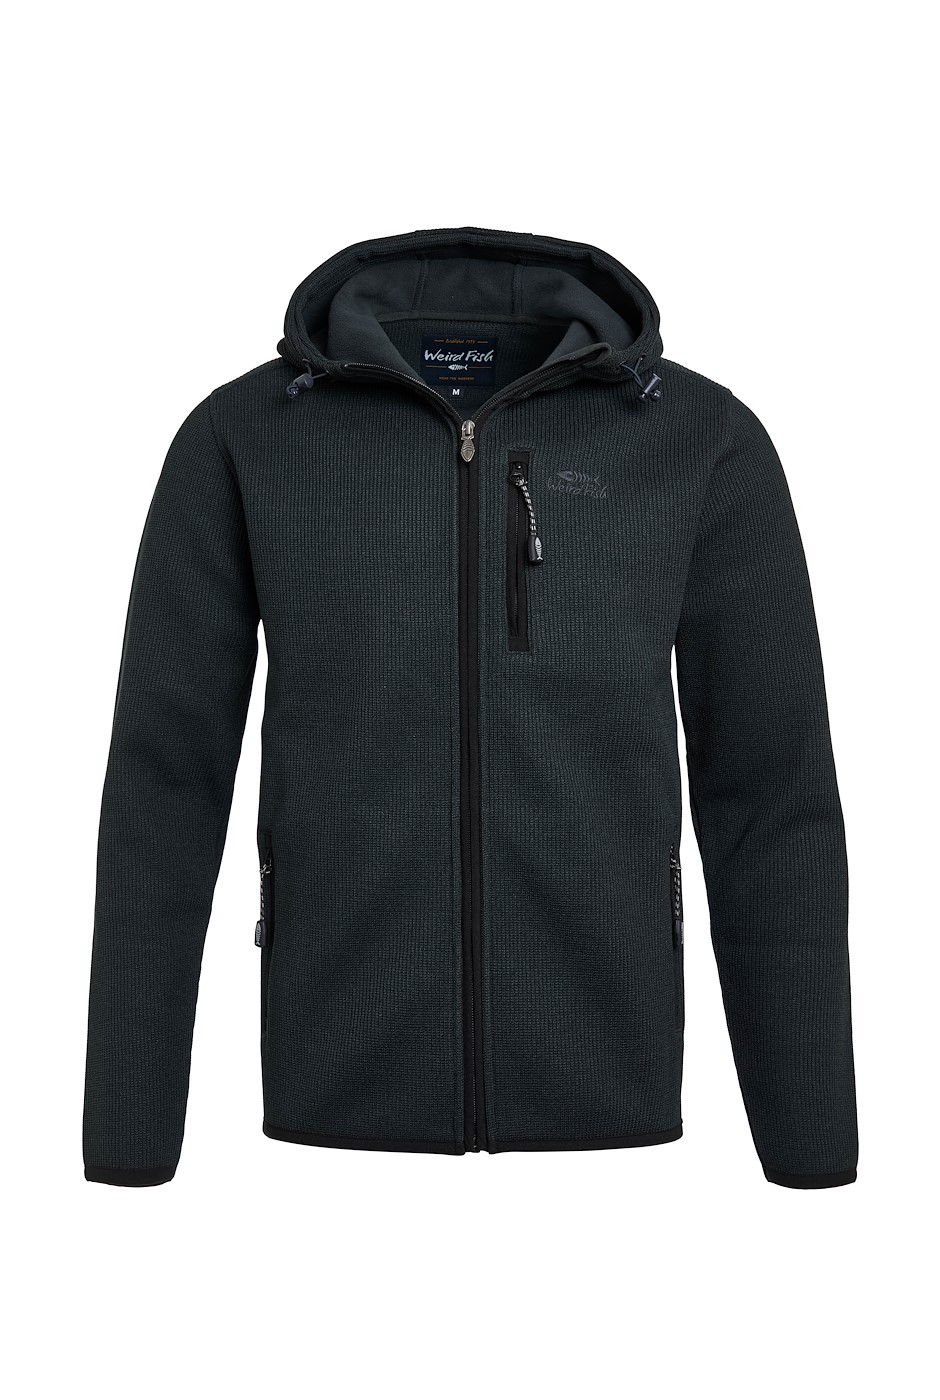 Lockie Recycled Full Zip Bonded Fleece Washed Black